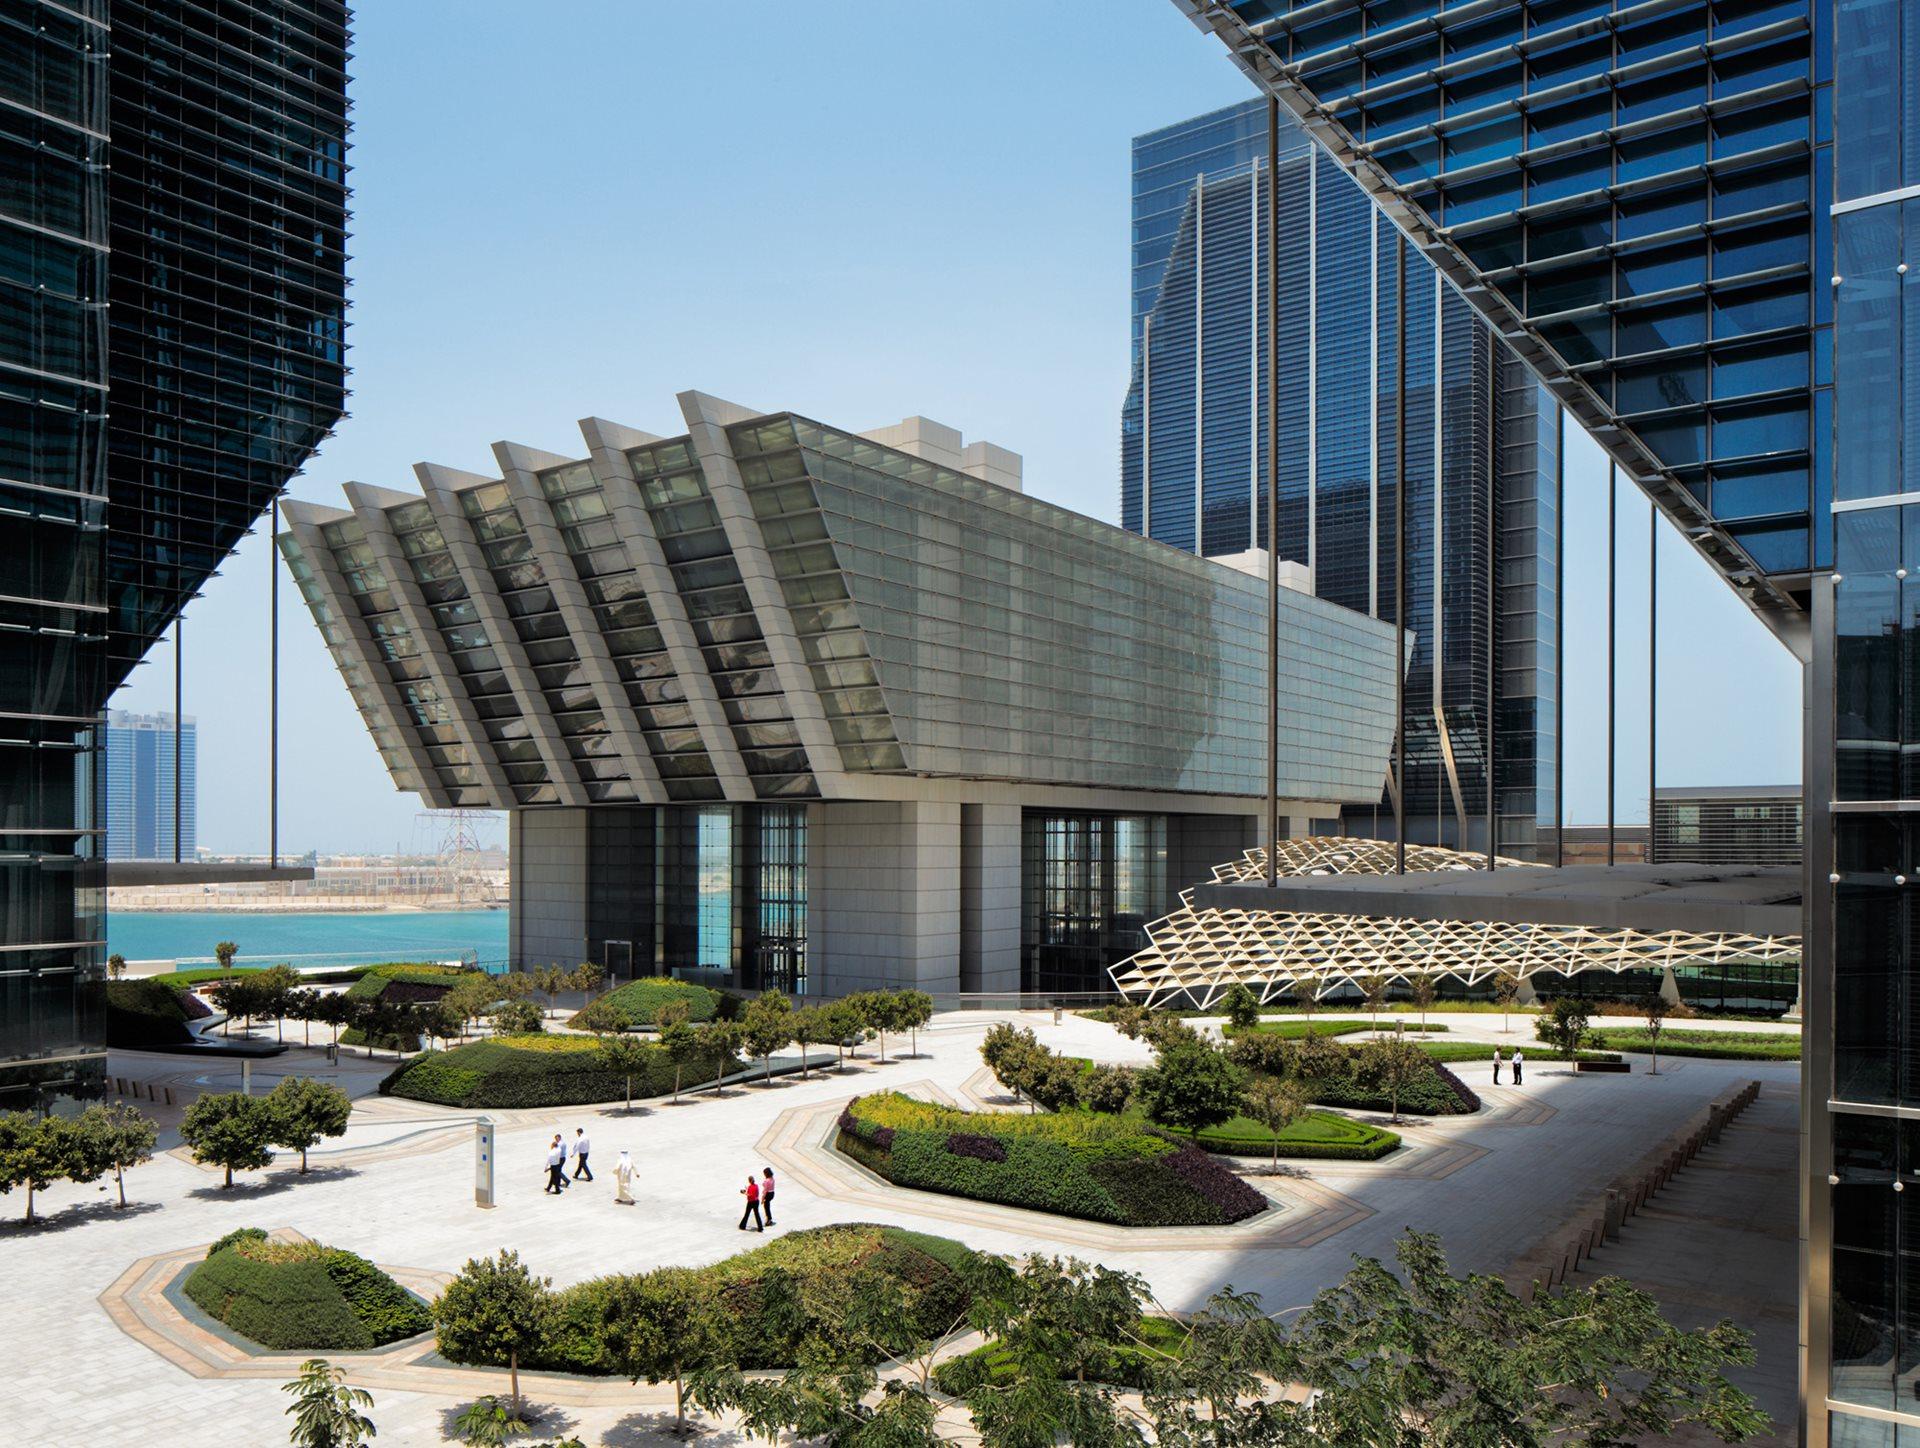 ADGM remains a key enabler of Abu Dhabi's startup ecosystem